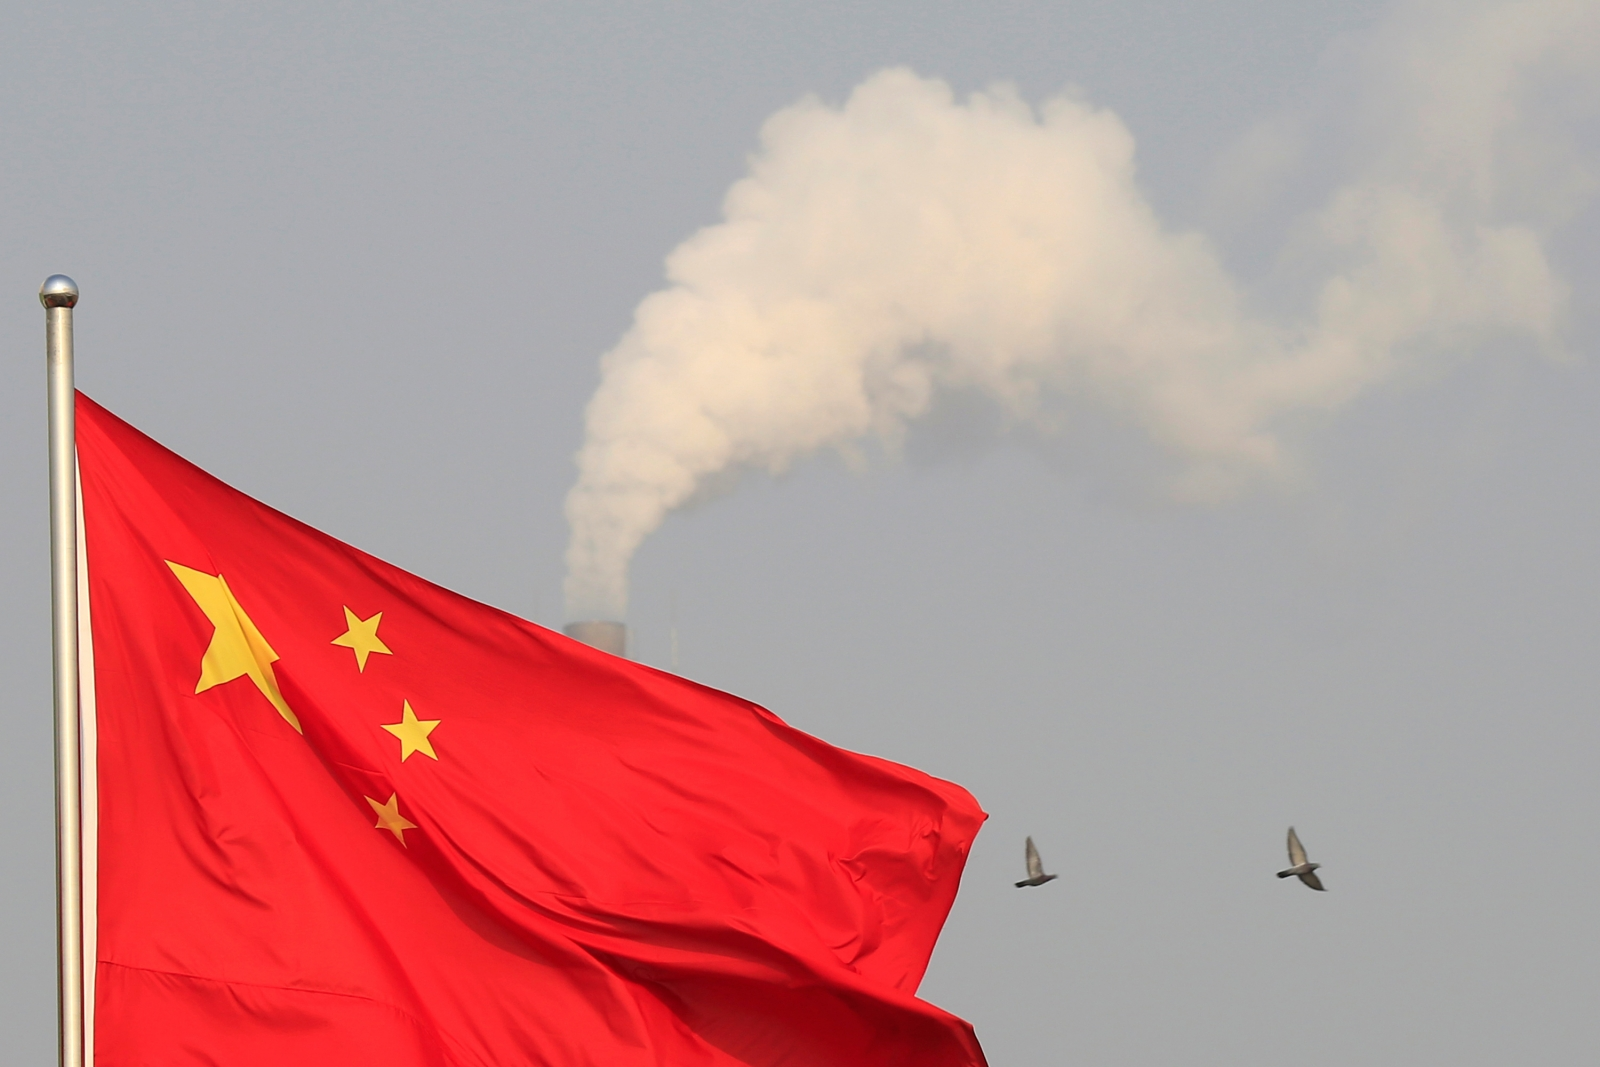 China national flag